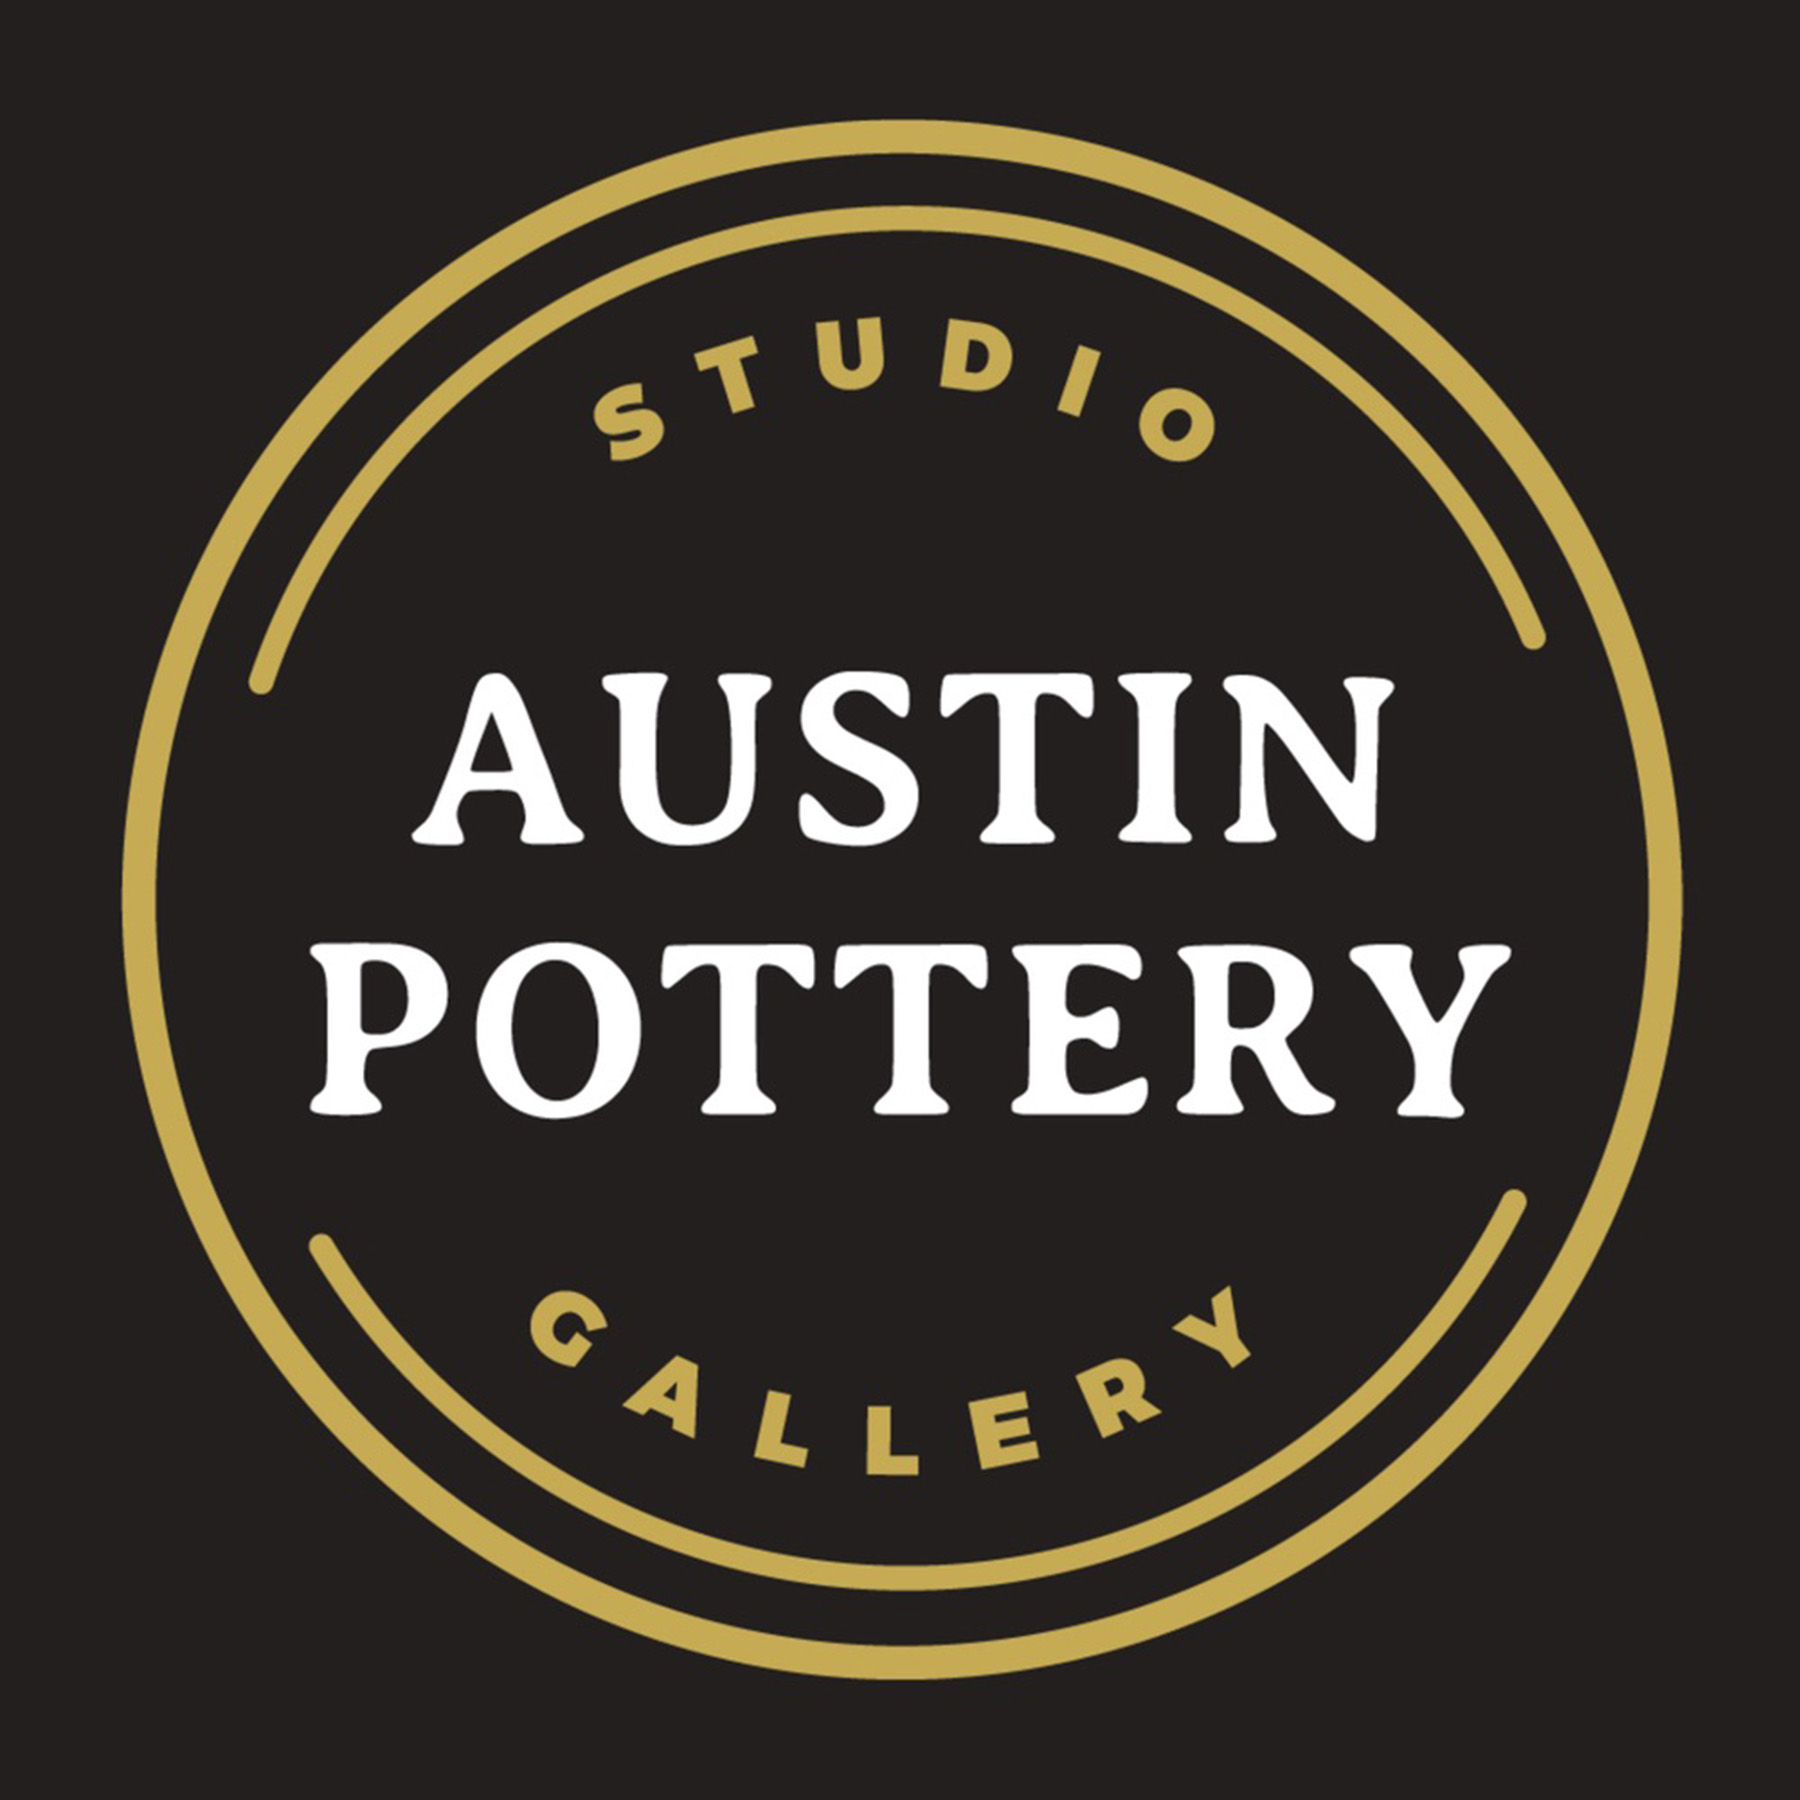 Austin Pottery Studio & Gallery